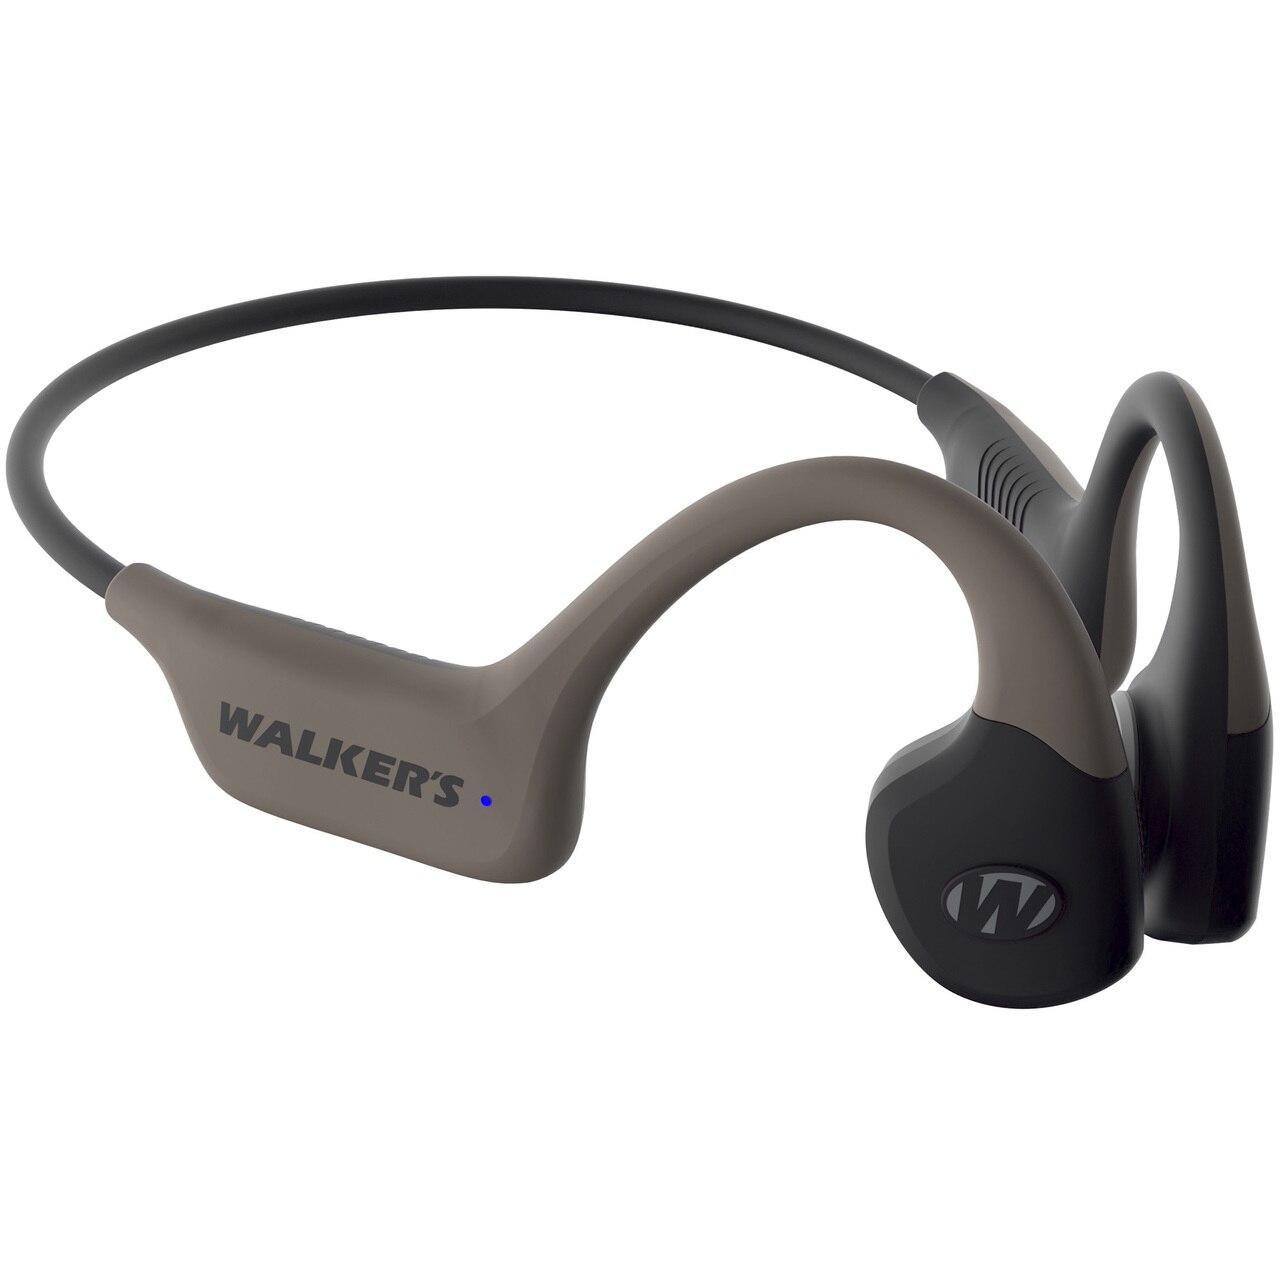 Walkers Walkers Headset Bone Conduction 888151026427